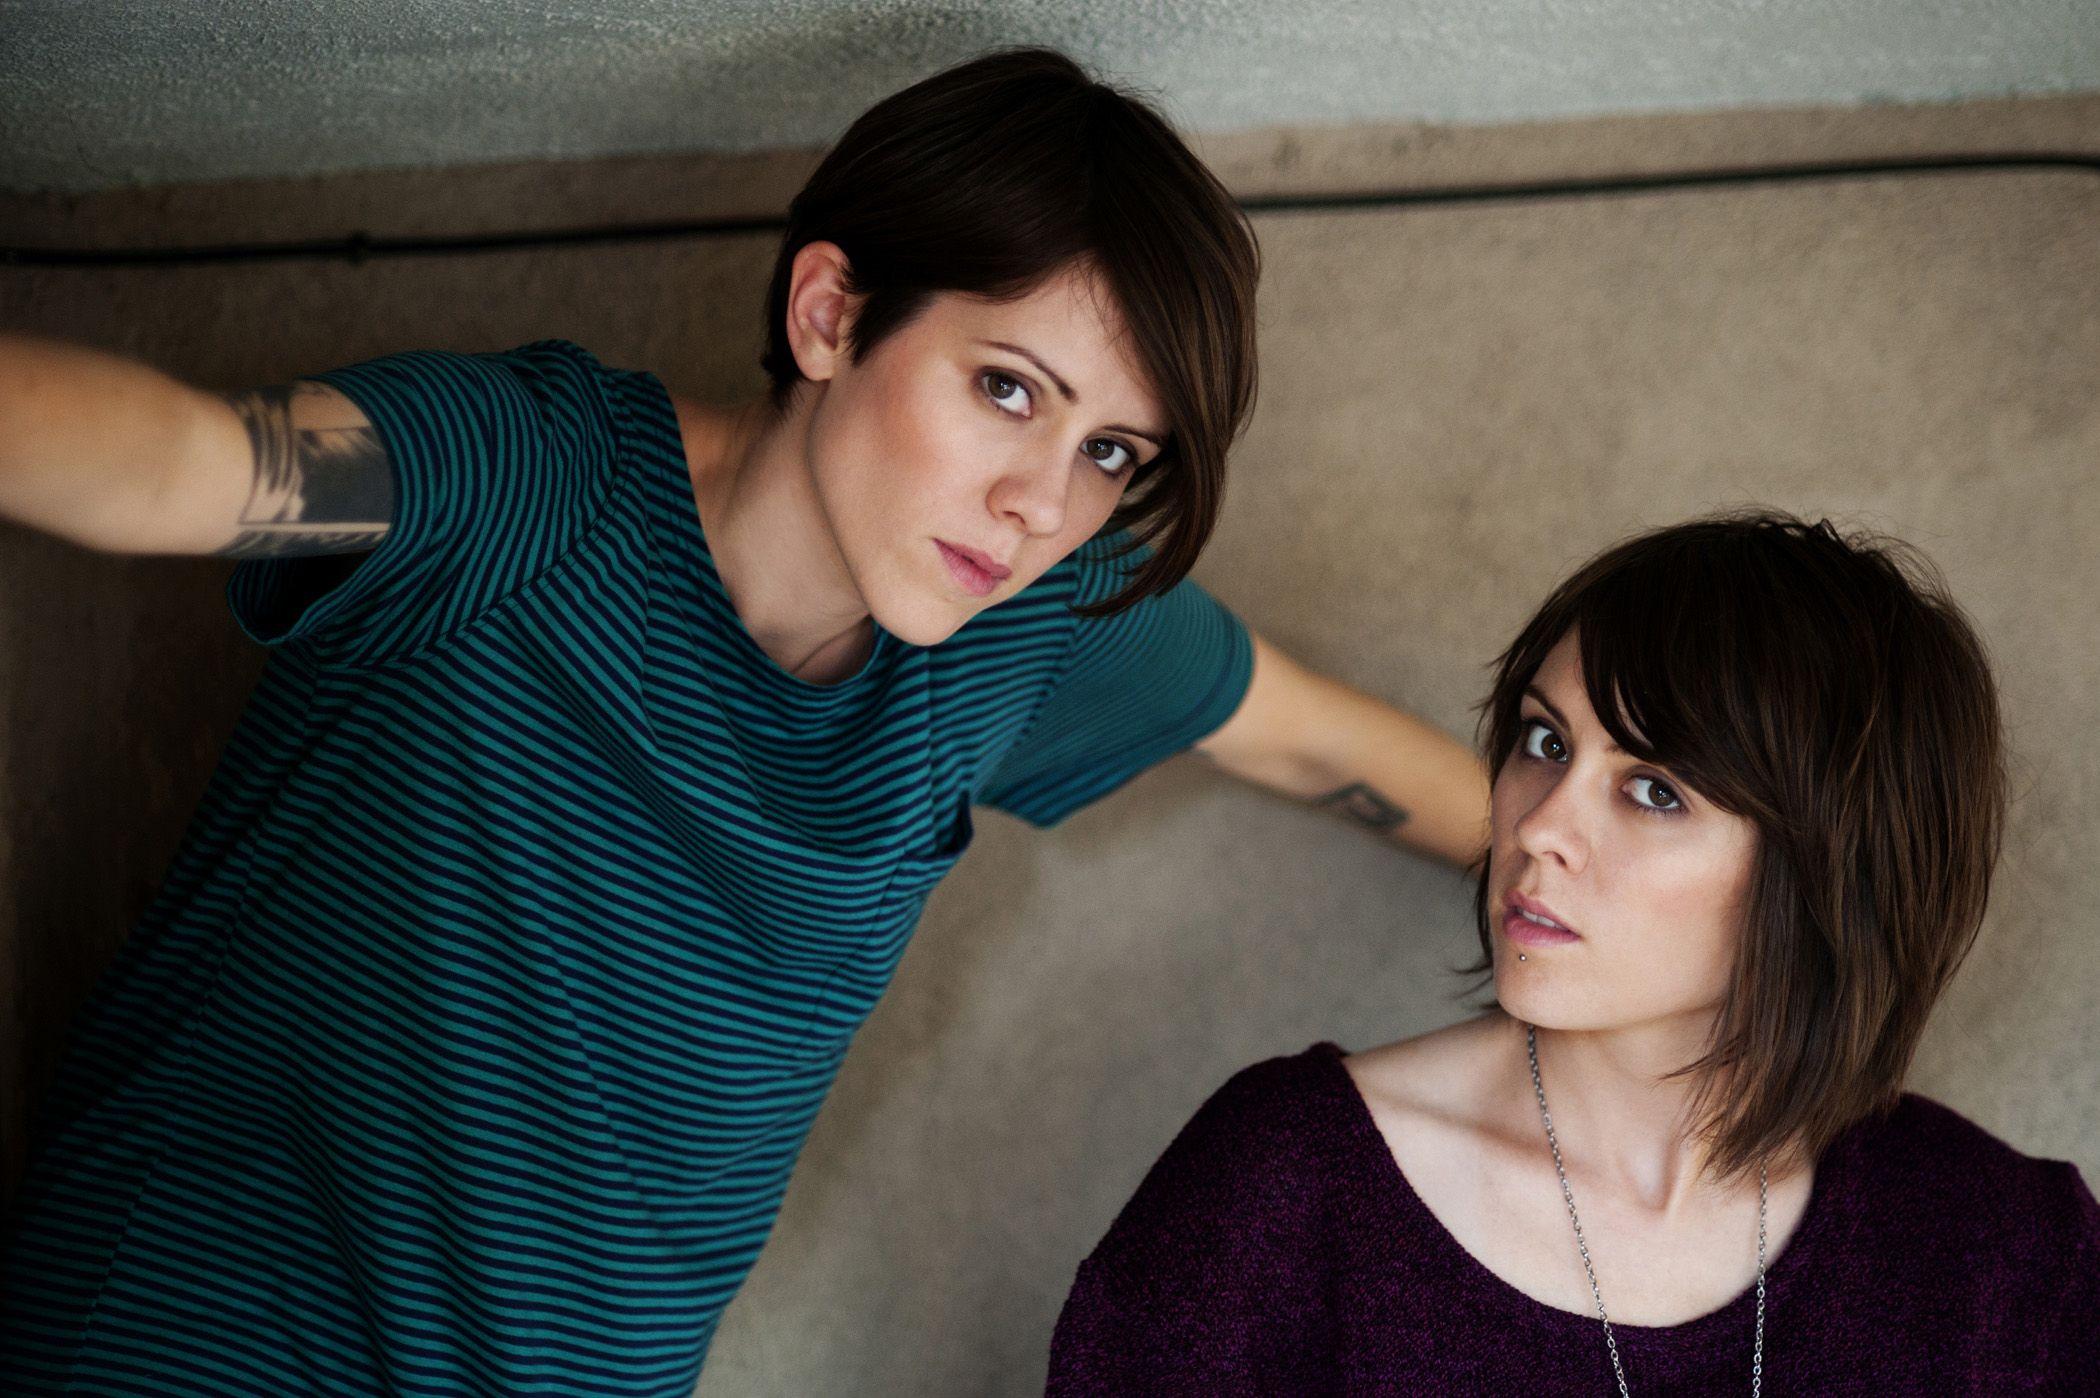 Tegan and Sara on Vimeo